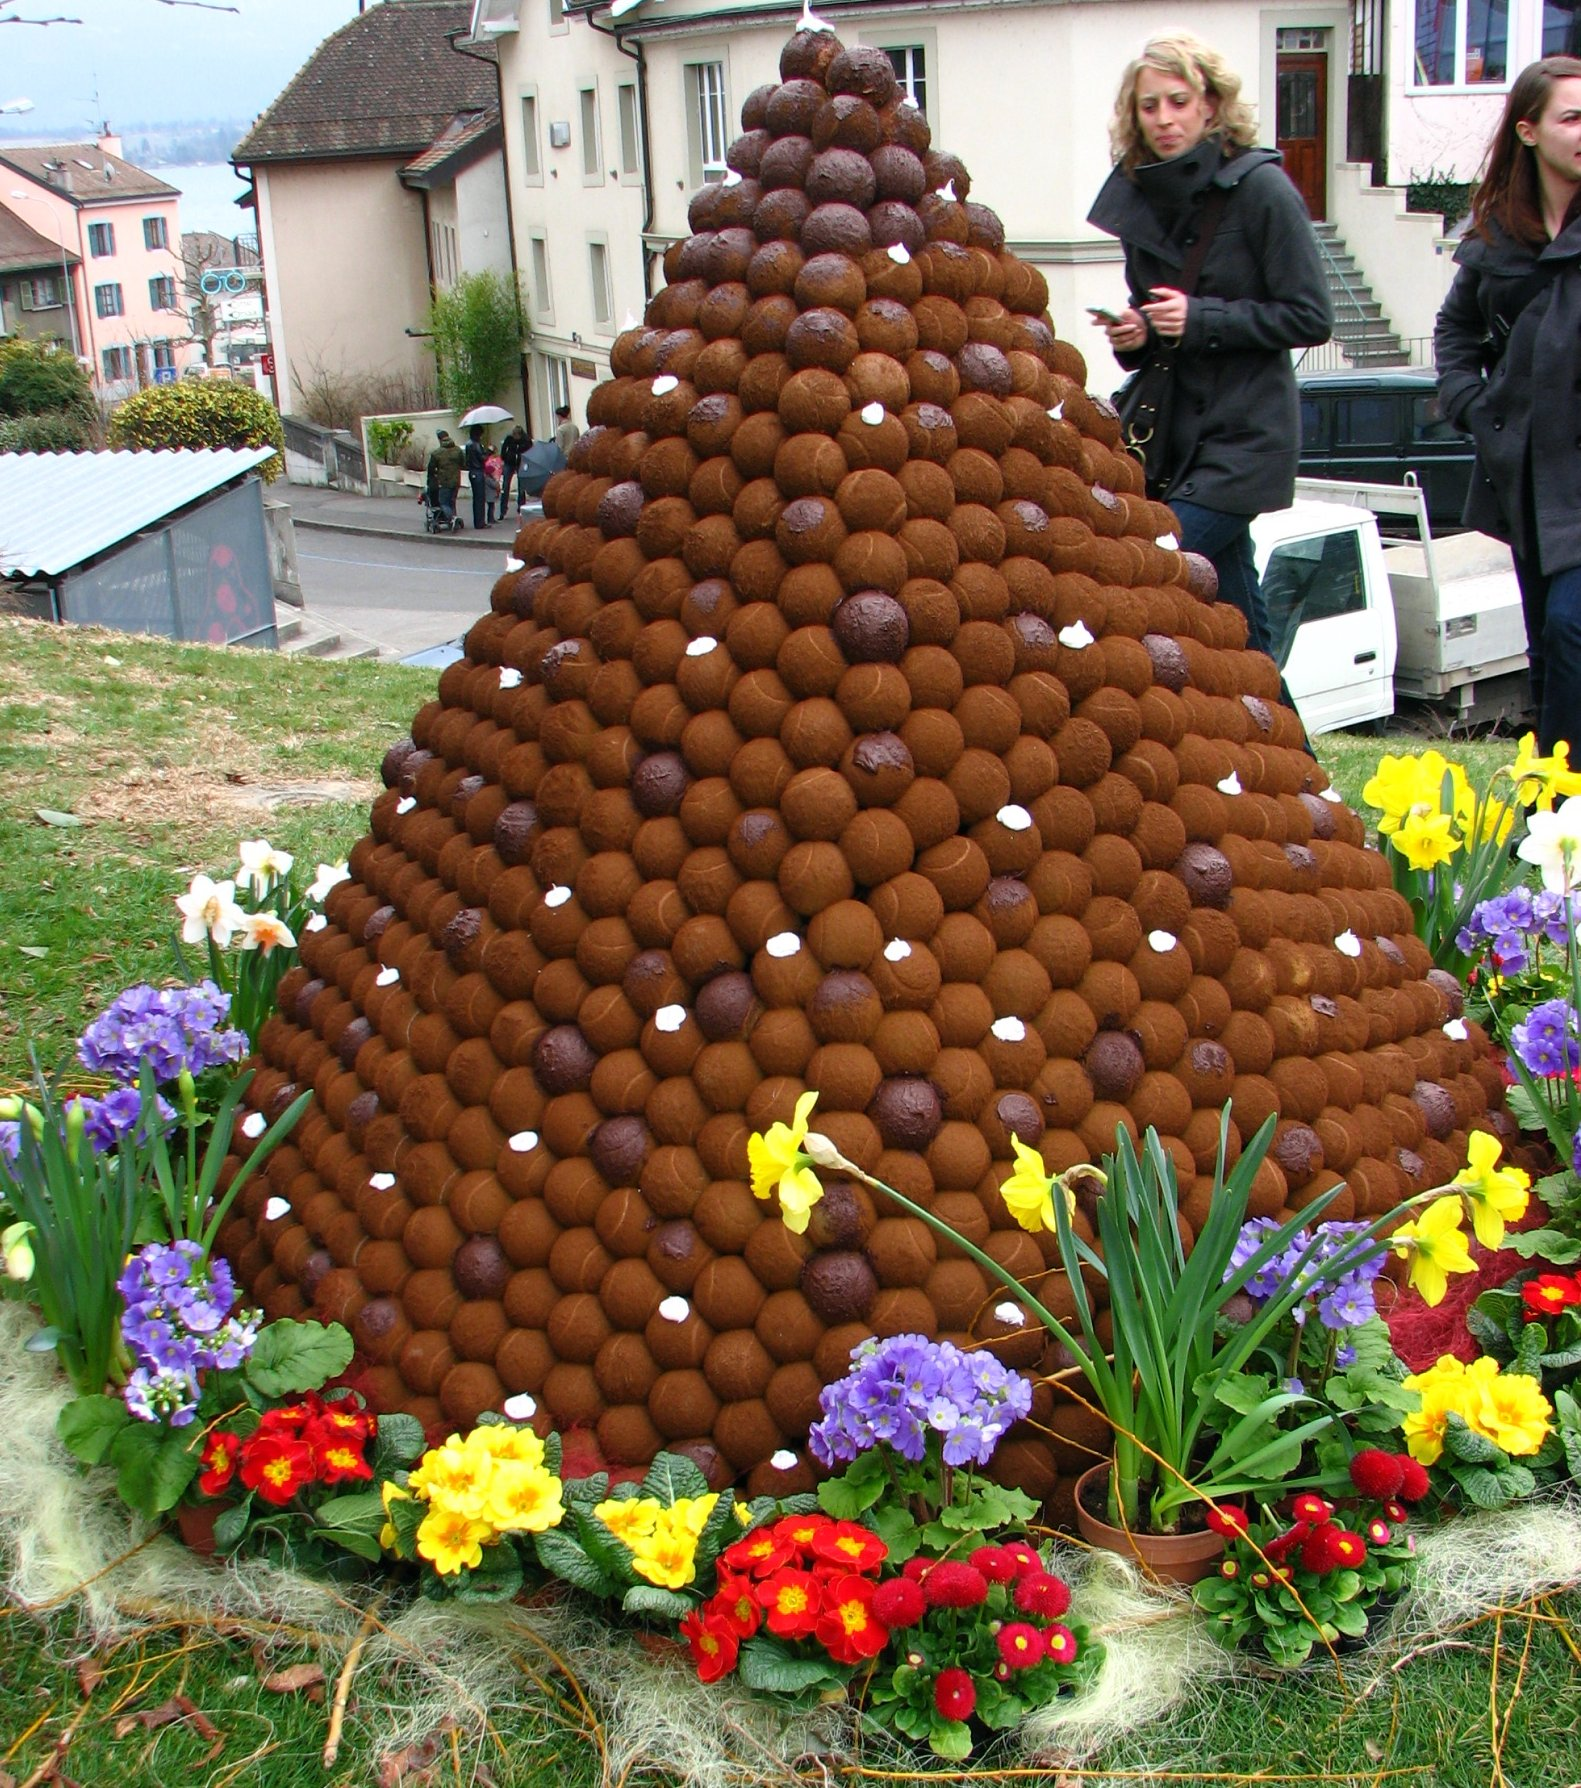 File:Chocolate Festival, Versoix- Switzerland2.jpg - Wikimedia Commons